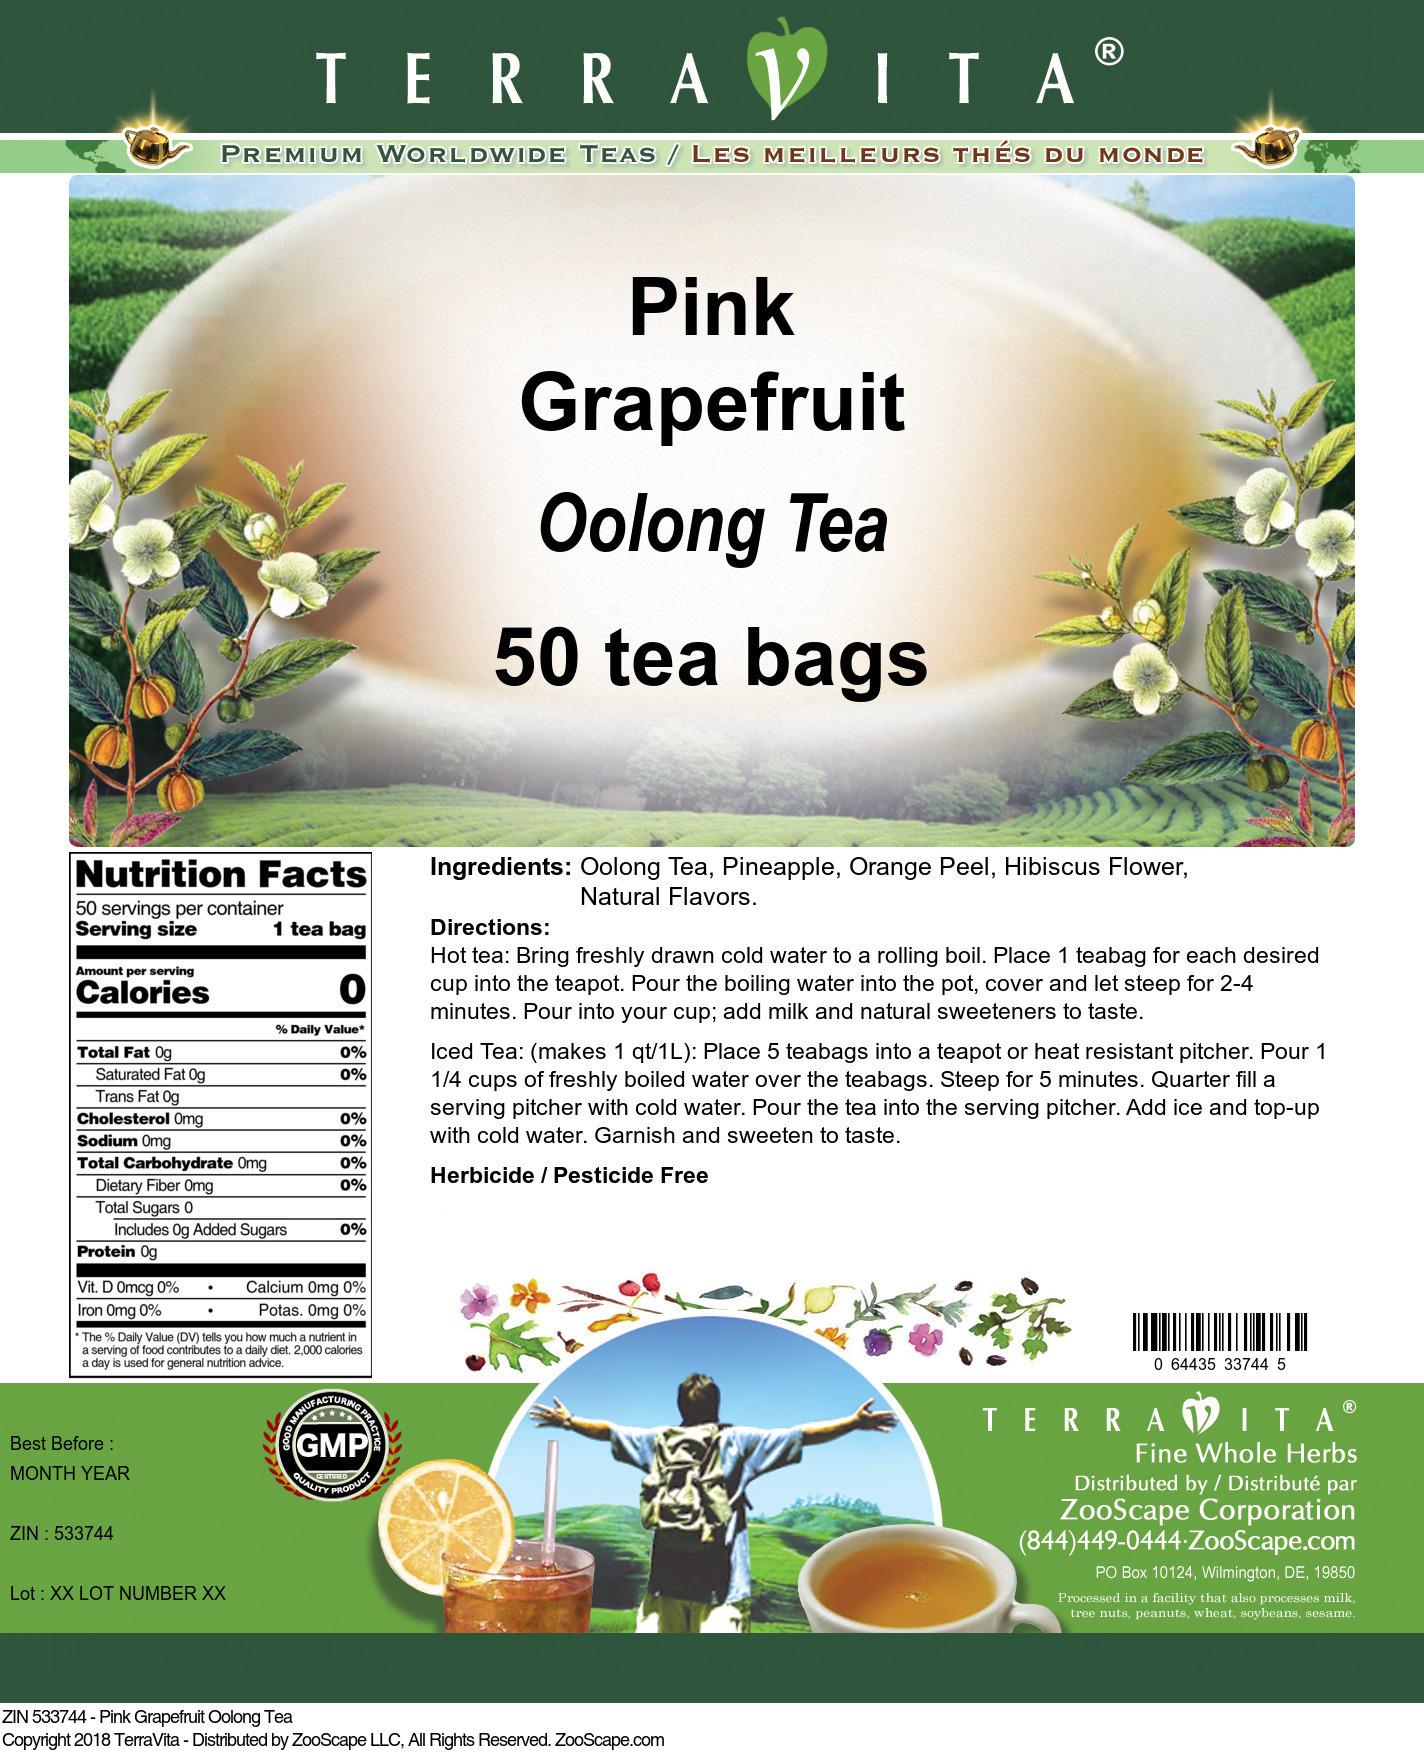 Pink Grapefruit Oolong Tea